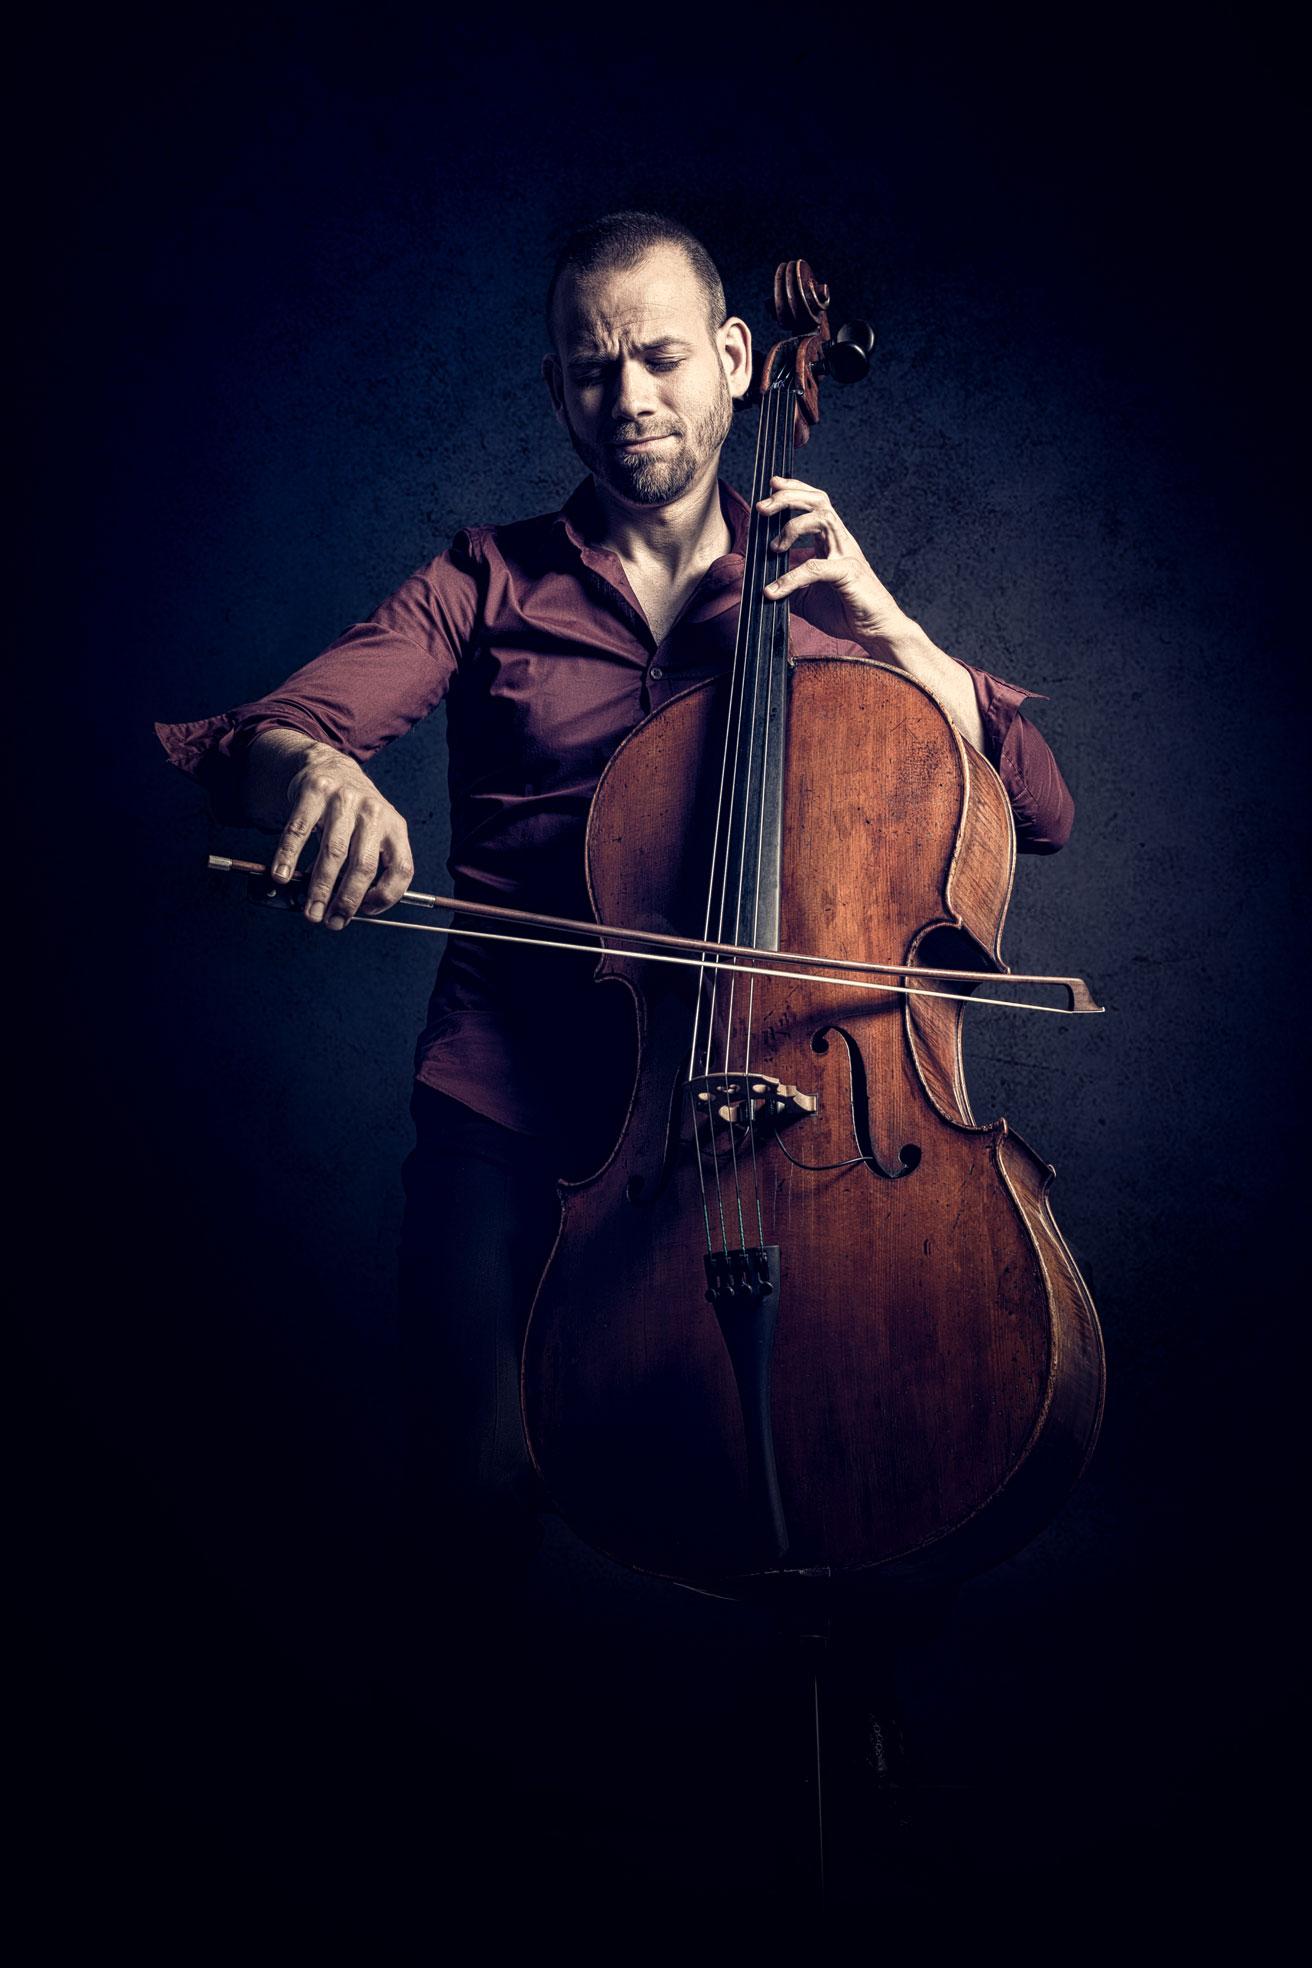 Matthias Hübner - Cellist bei TROjKA